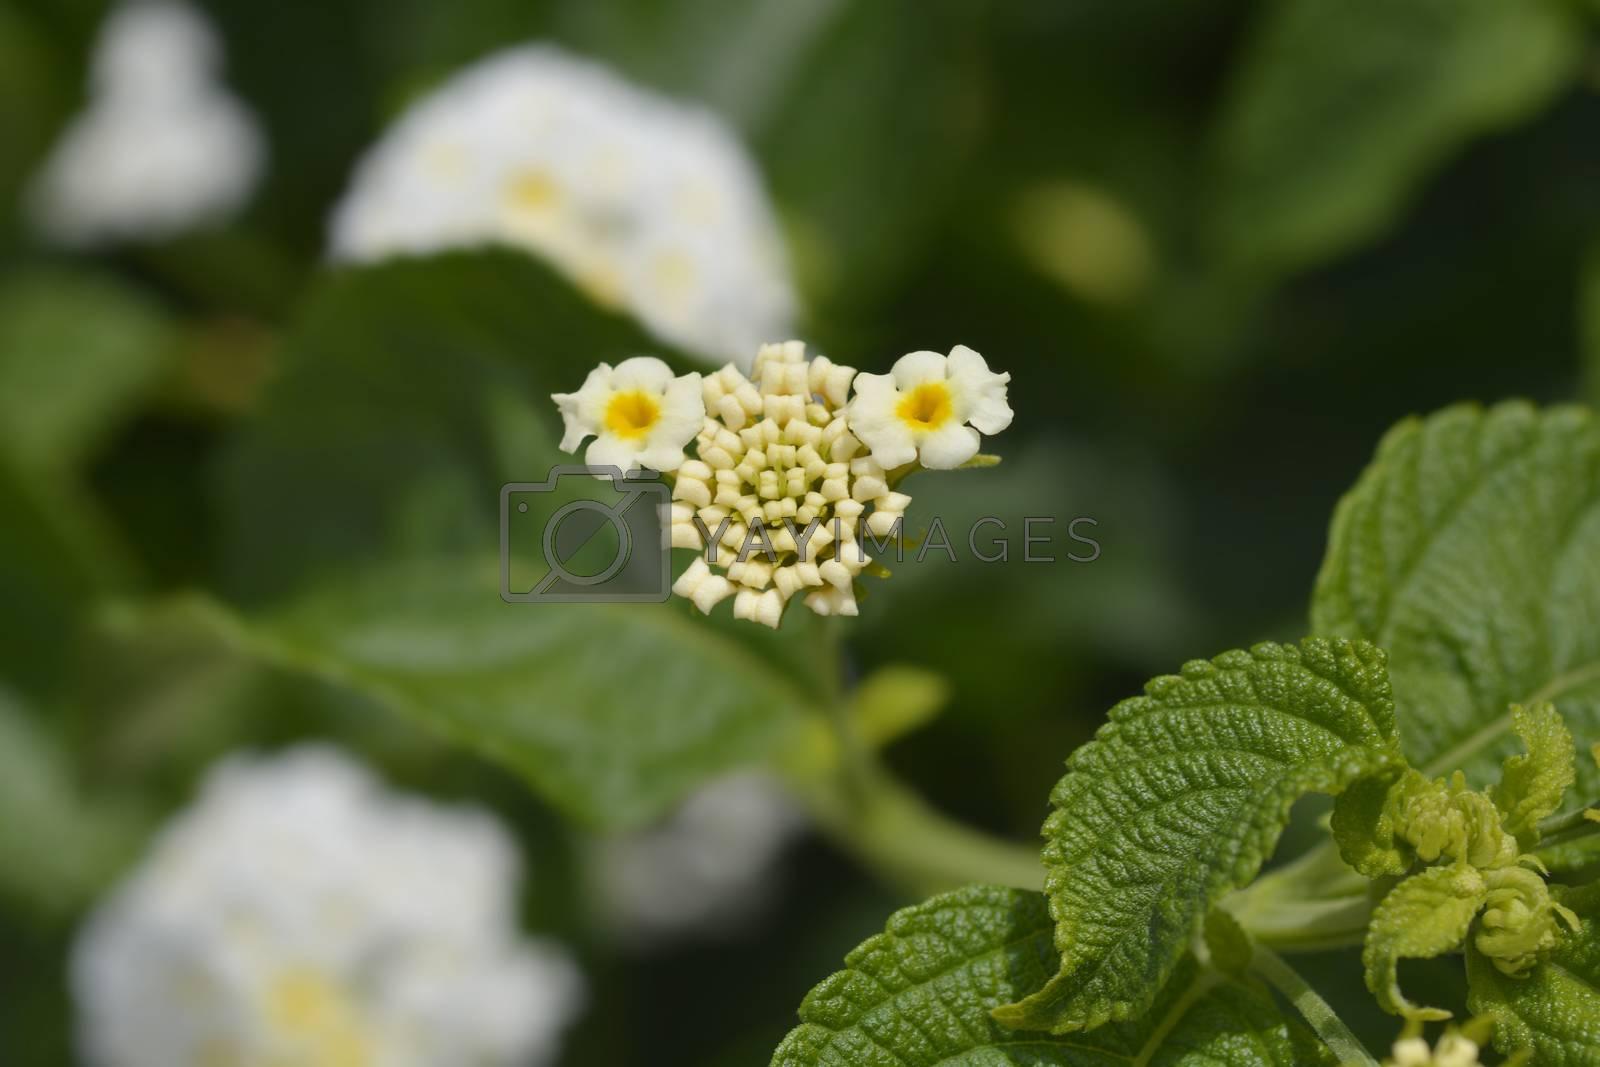 Shrub verbena flower close up - Latin name - Lantana camara